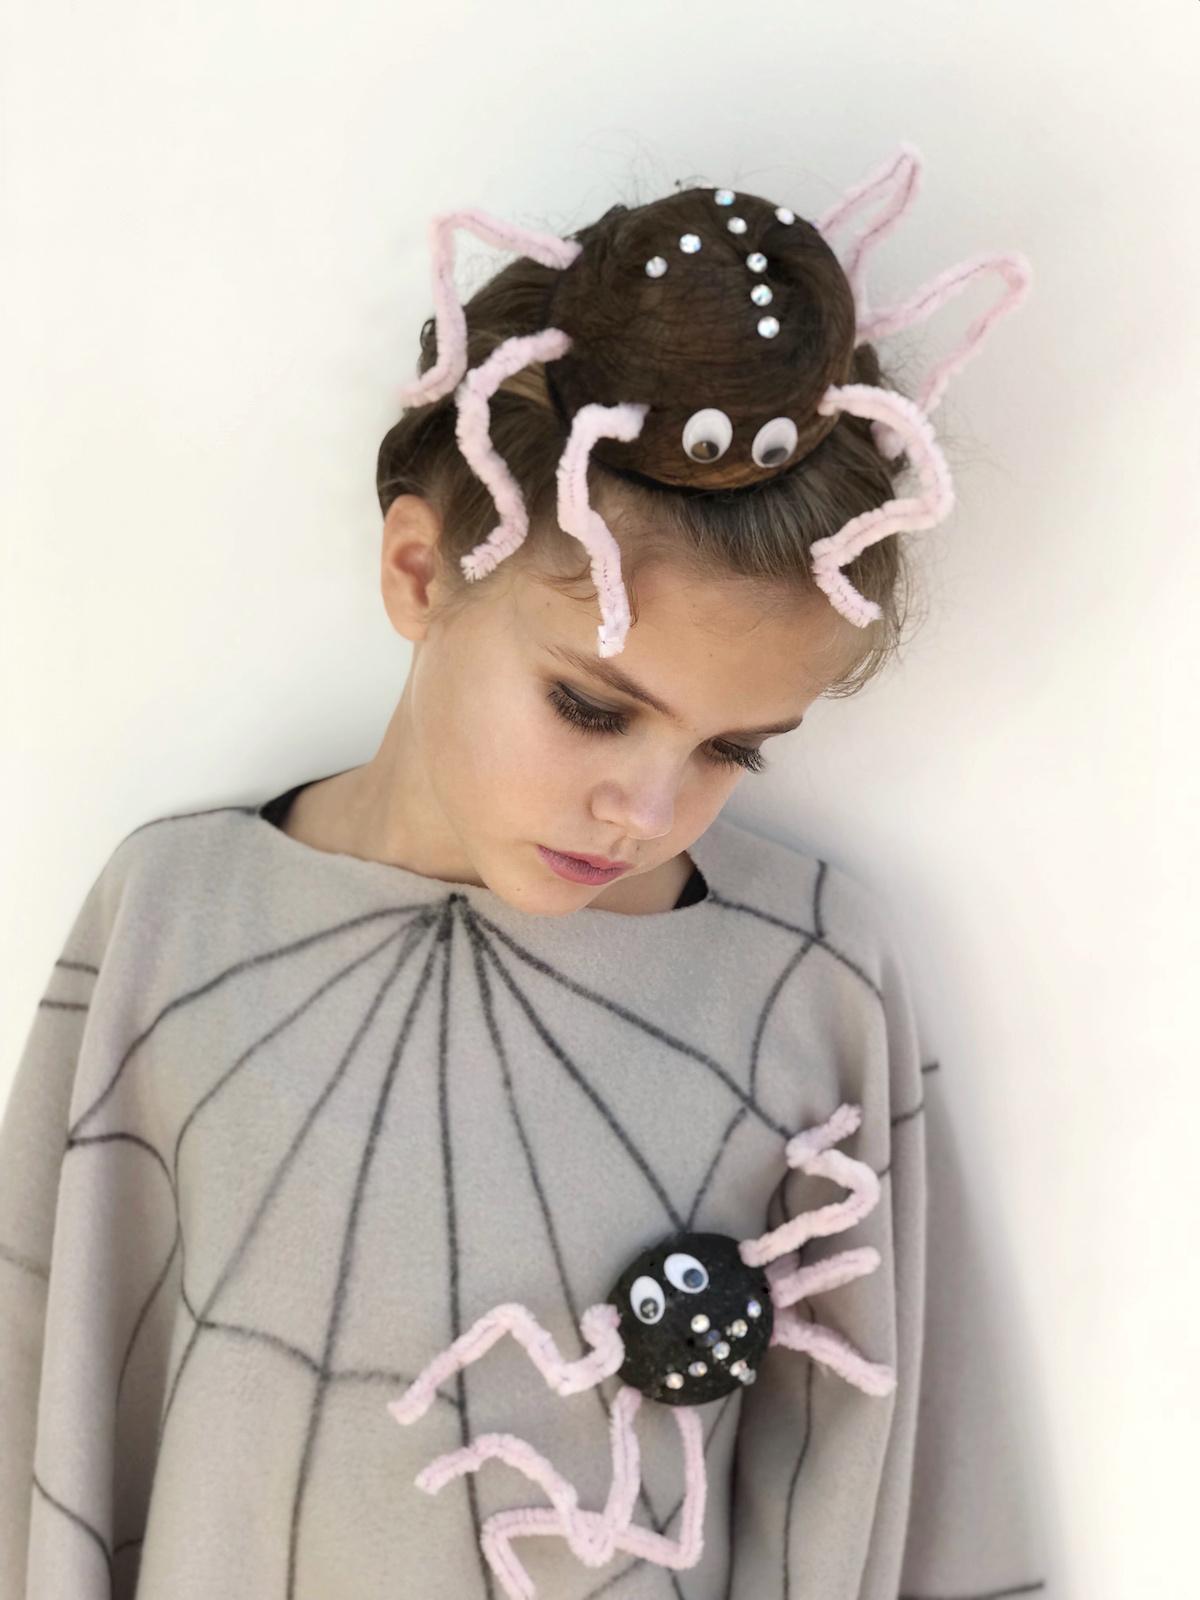 kostum pajek noc carovnic halloween zabava beautyfullblog